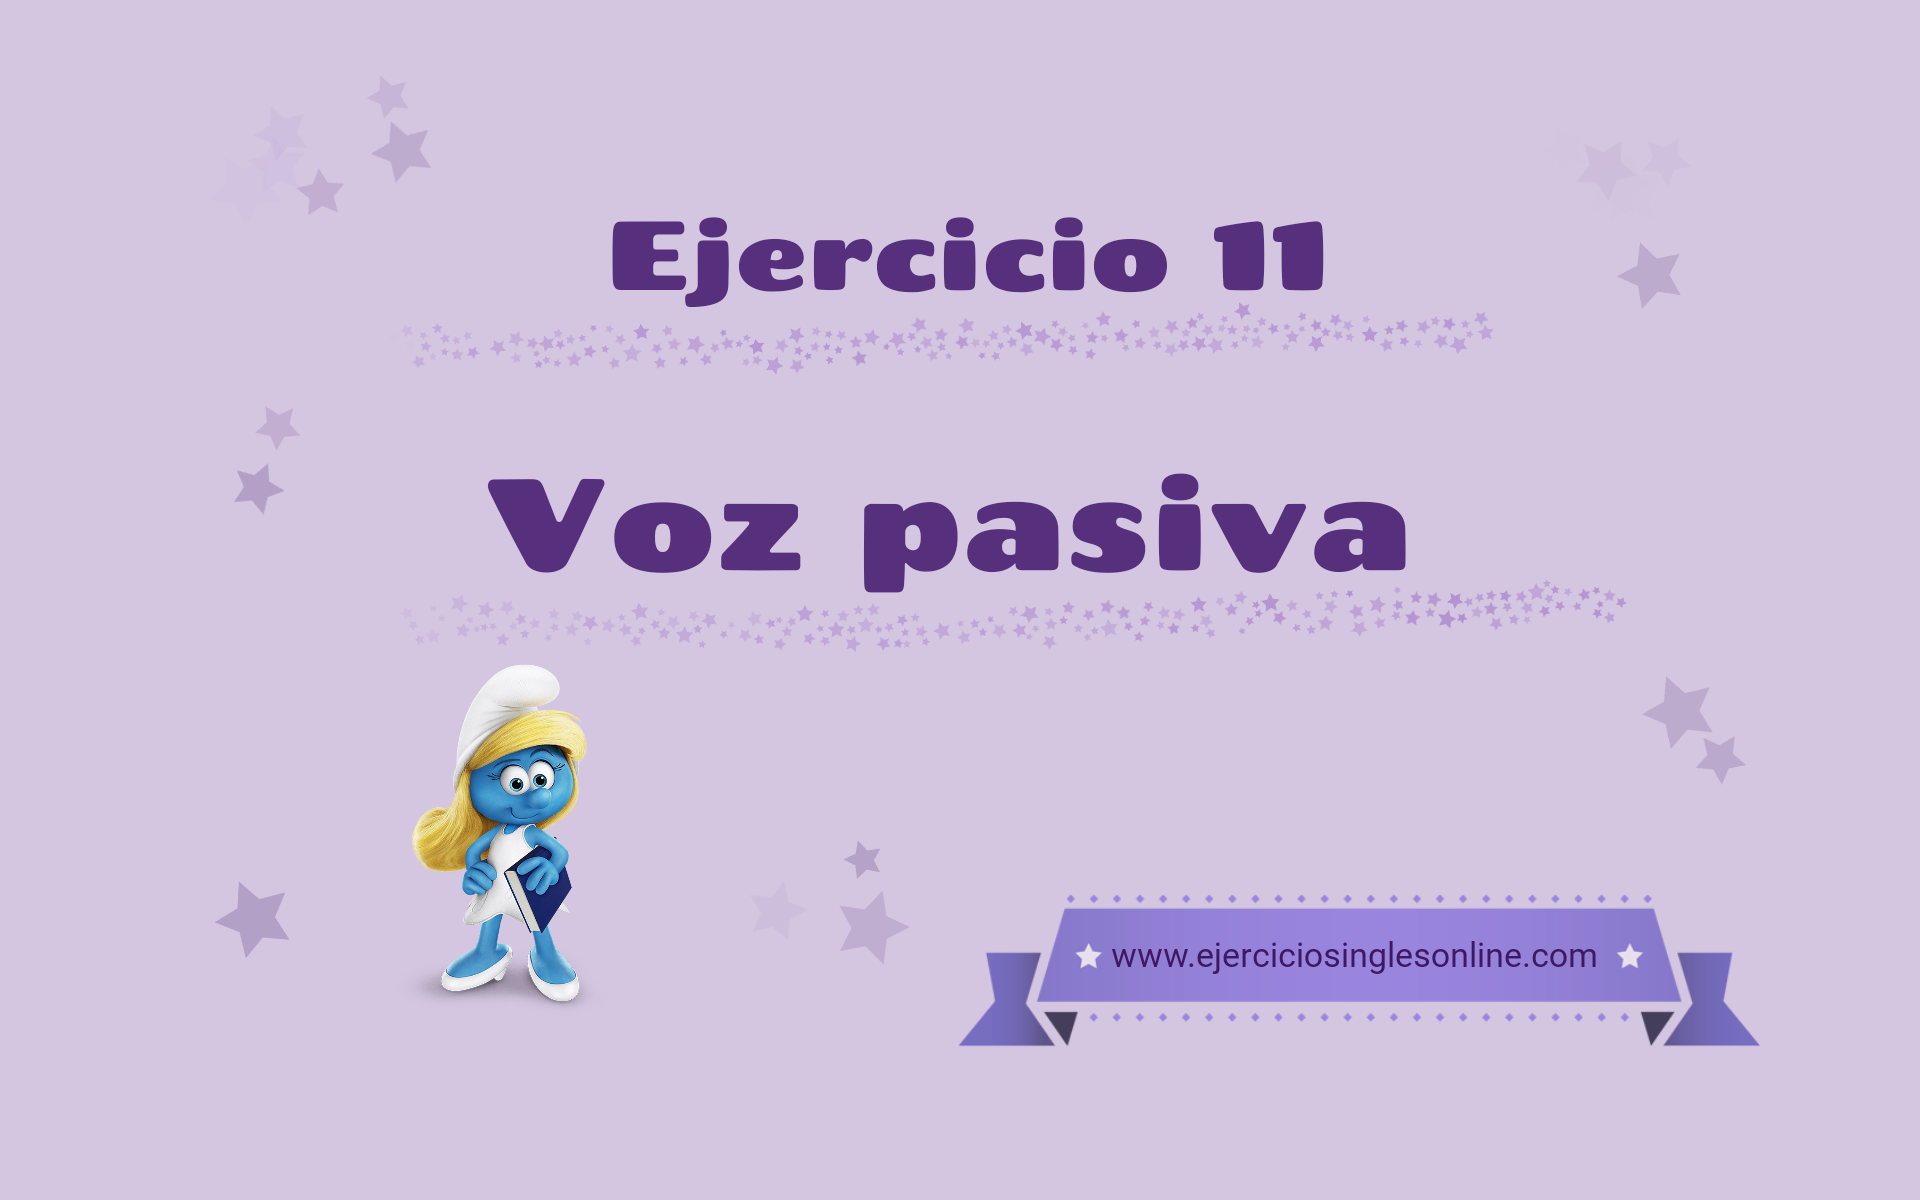 Voz pasiva - Ejercicio 11